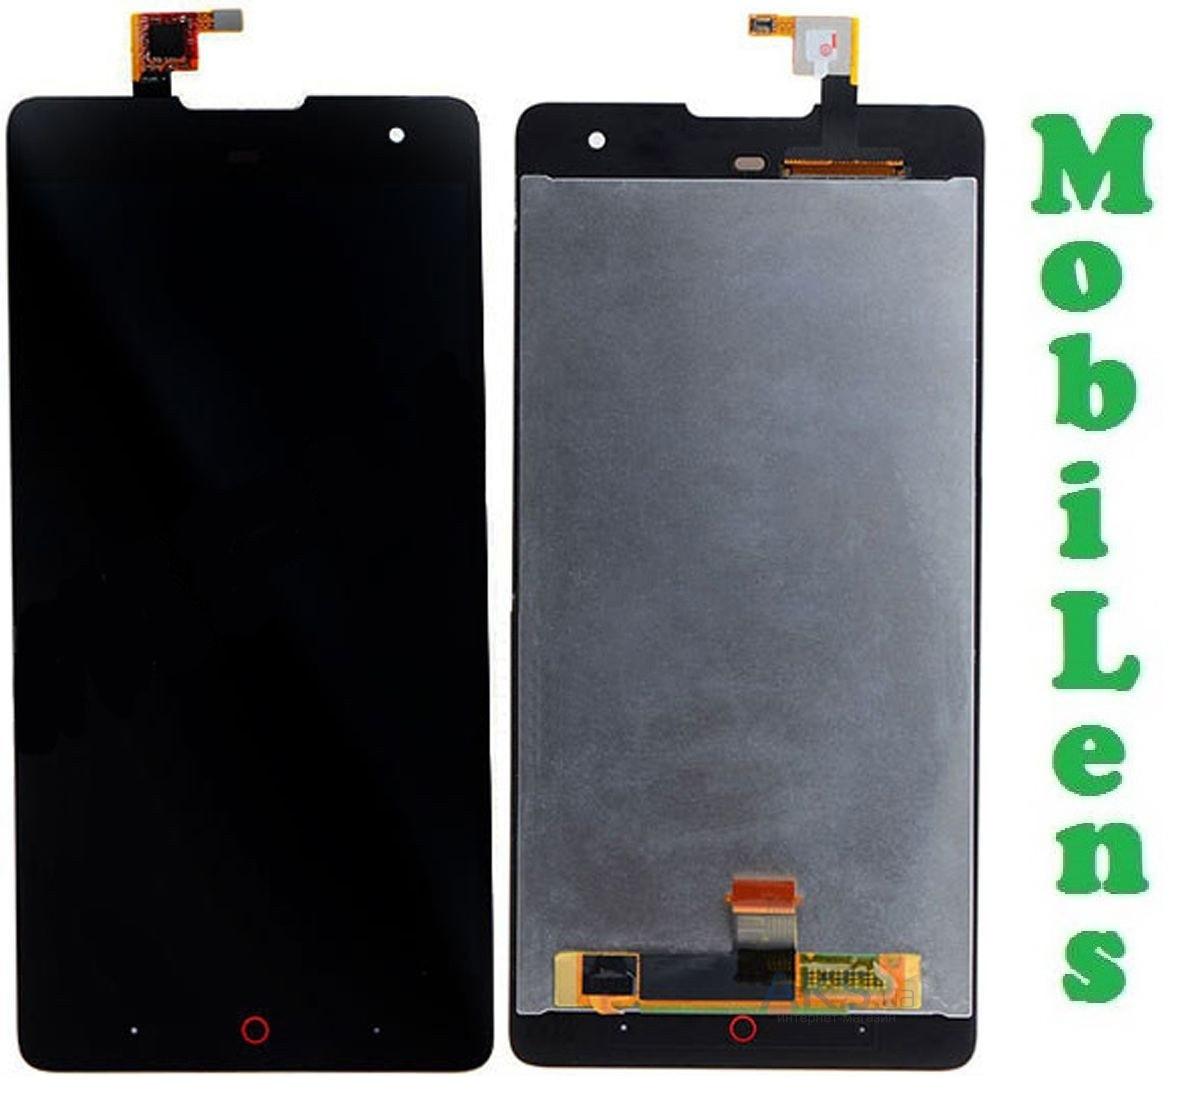 ZTE Z7 Max, Nubia Z7 Max, NX505J Дисплей+тачскрин(сенсор) черный